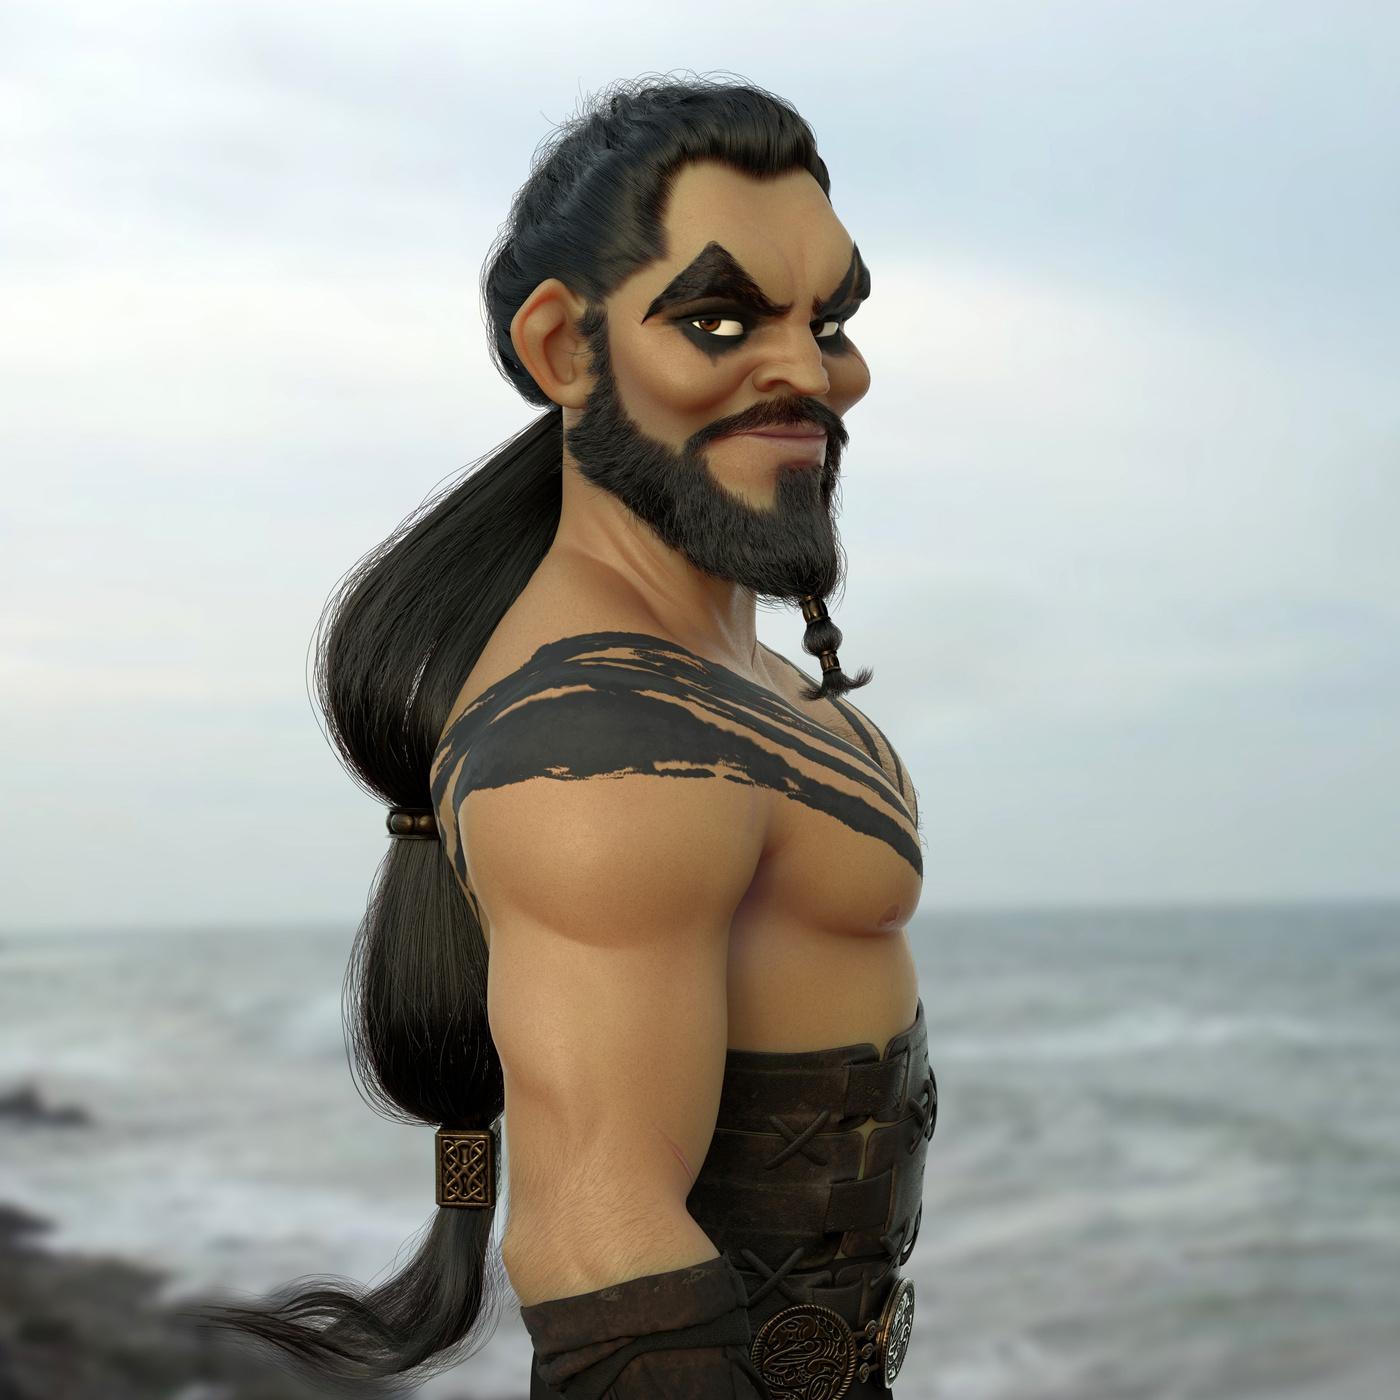 khal drogo game of thrones model stylised character design reneder